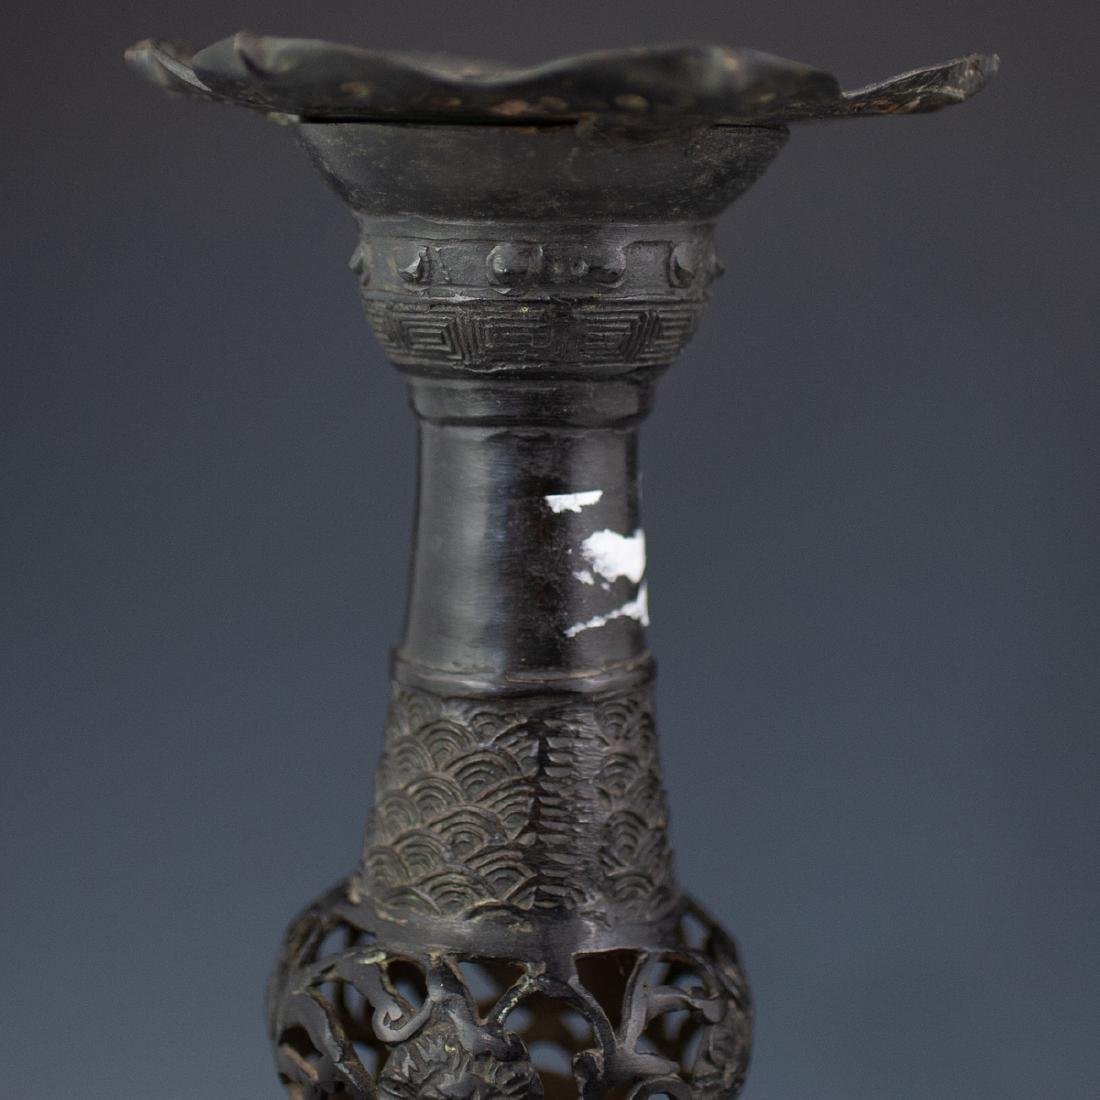 Japanese Bronze Altar Candlesticks - 7